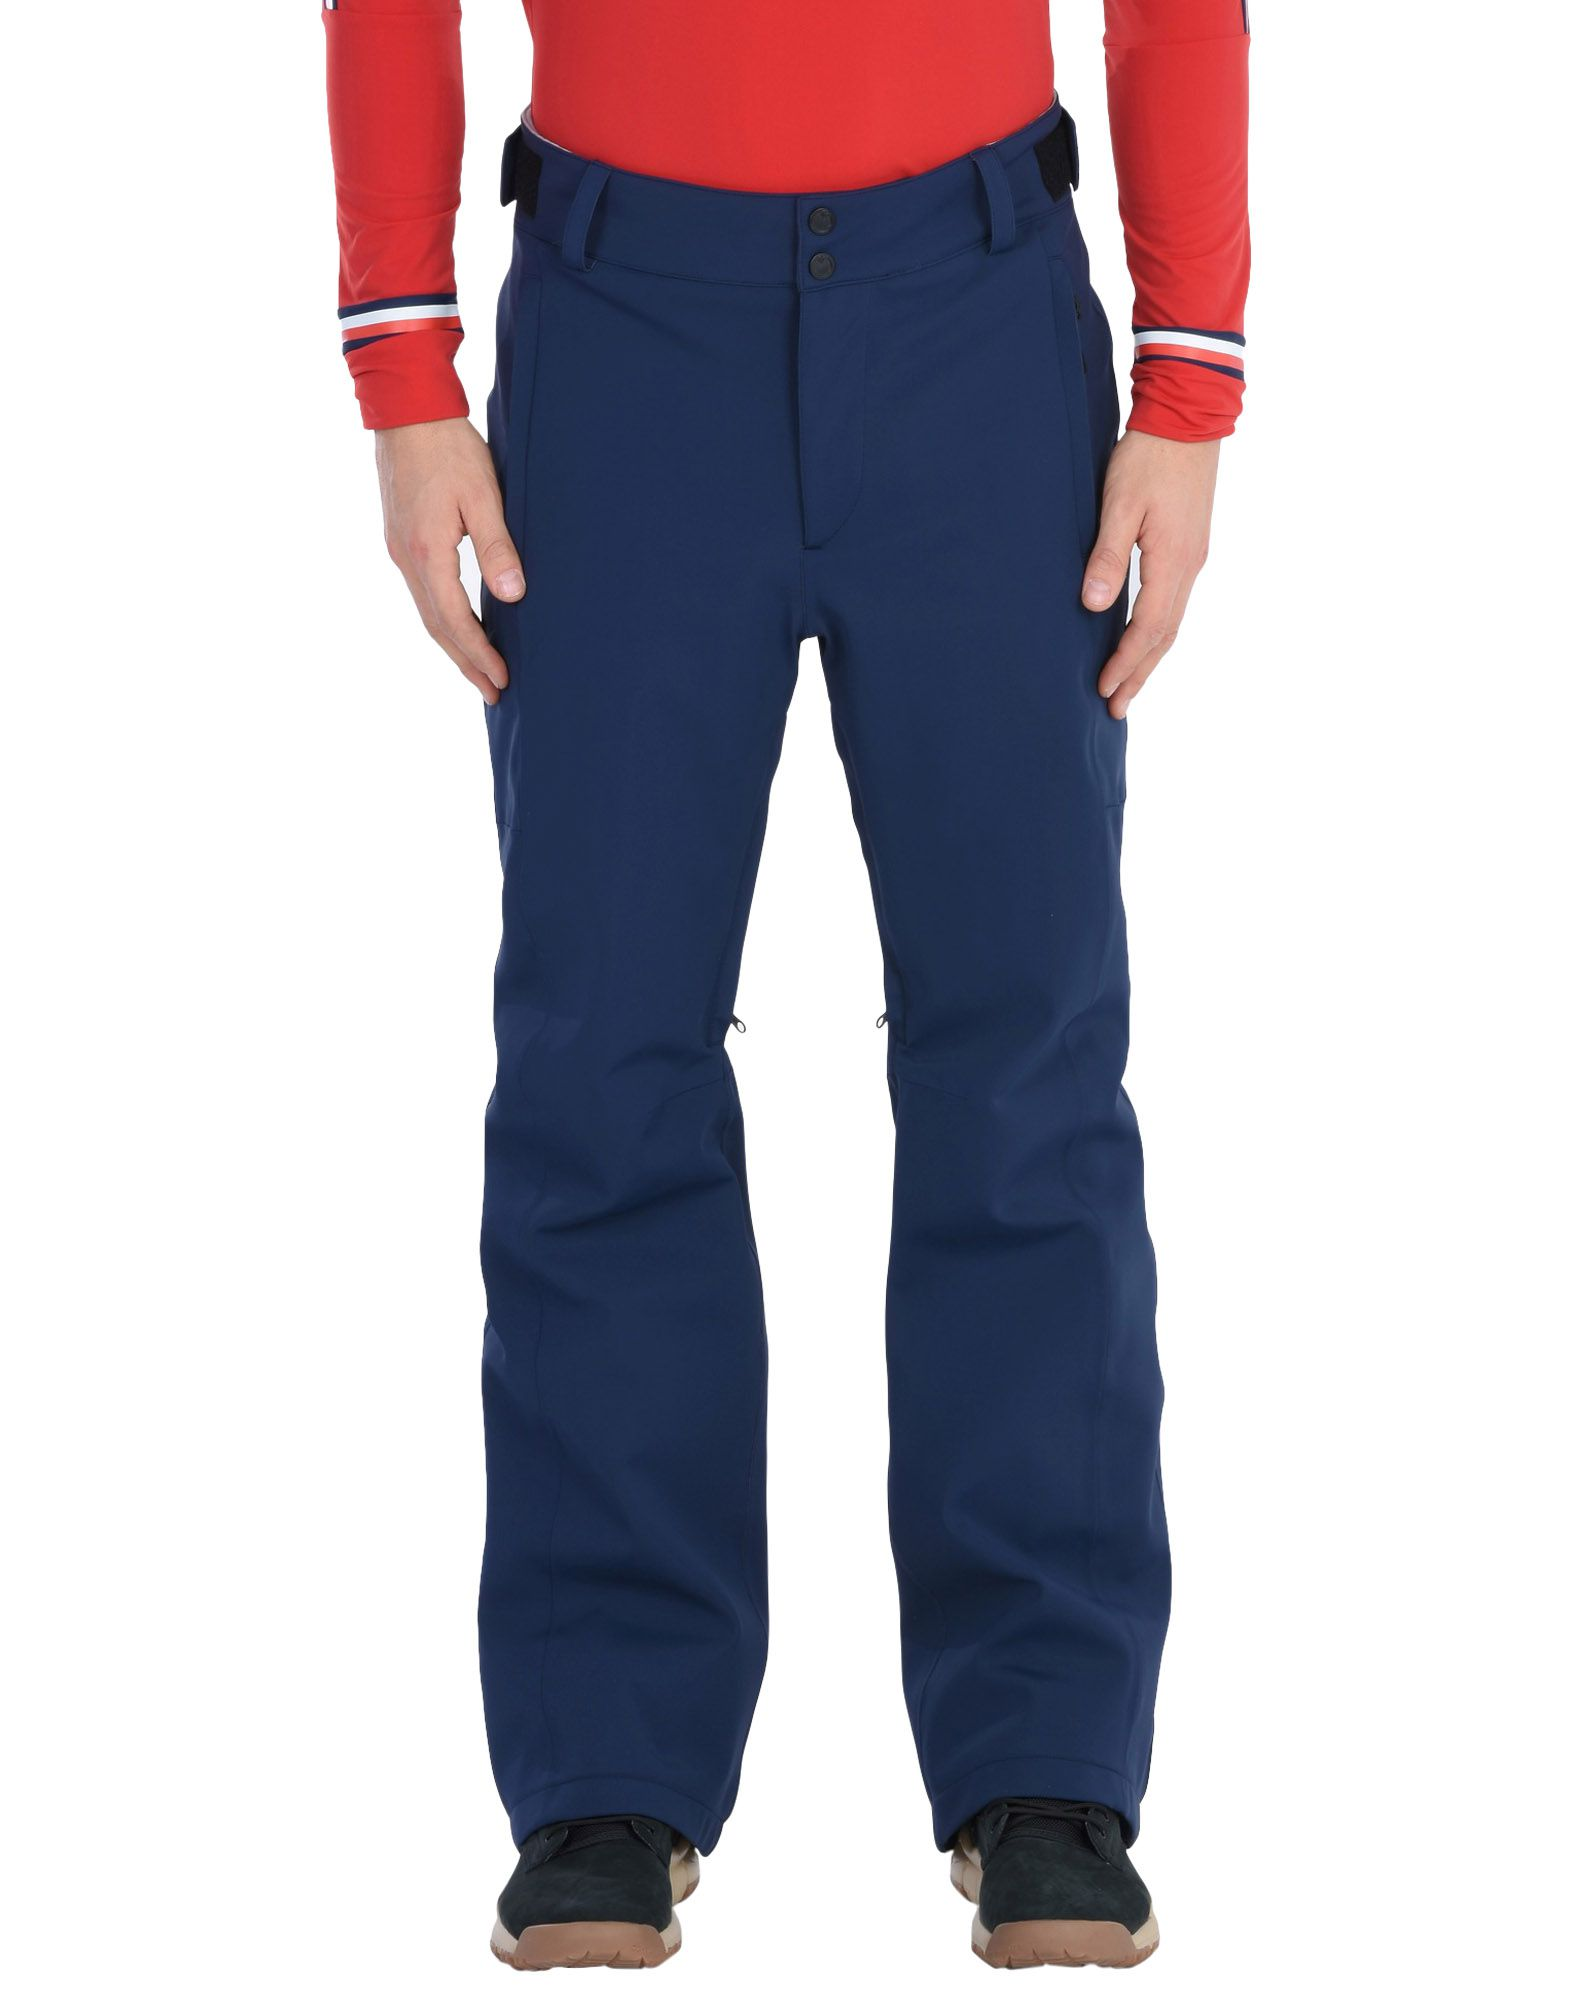 TOMMY HILFIGER x ROSSIGNOL メンズ スキーウェア RONAN SKI PANT ダークブルー